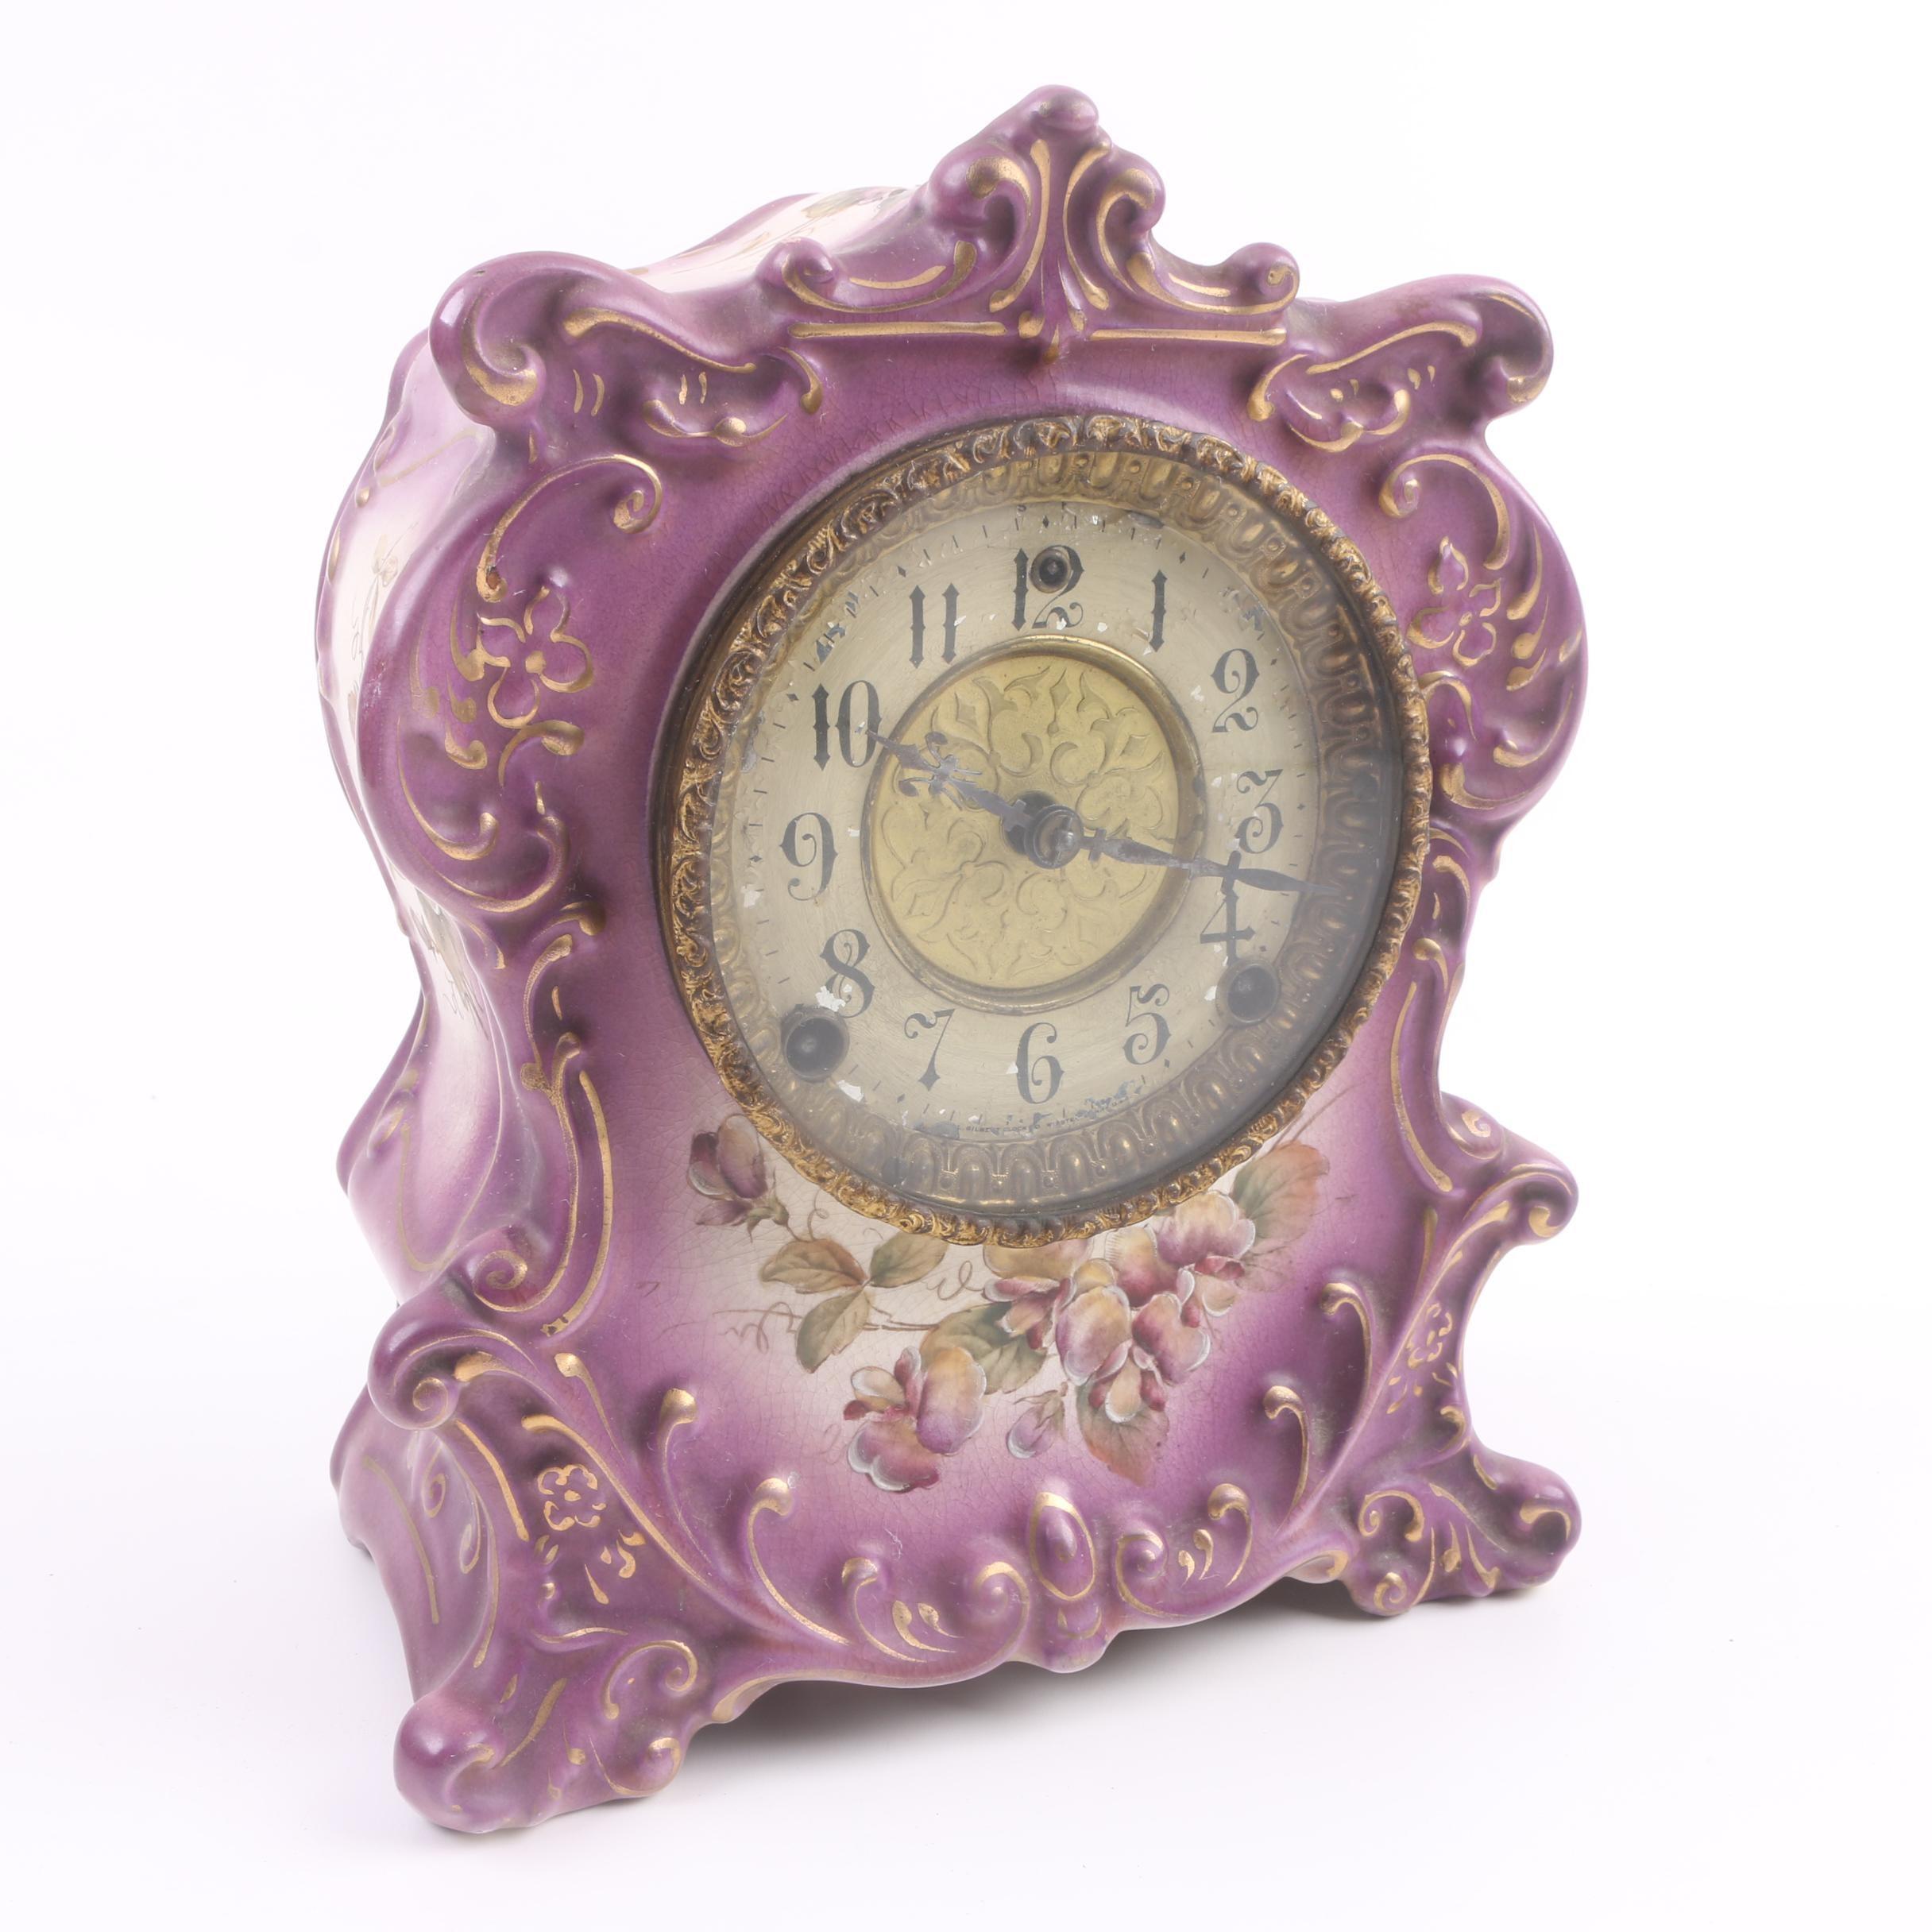 Circa 1900 Wm. L. Gilbert Clock Co. Porcelain Mantel Clock